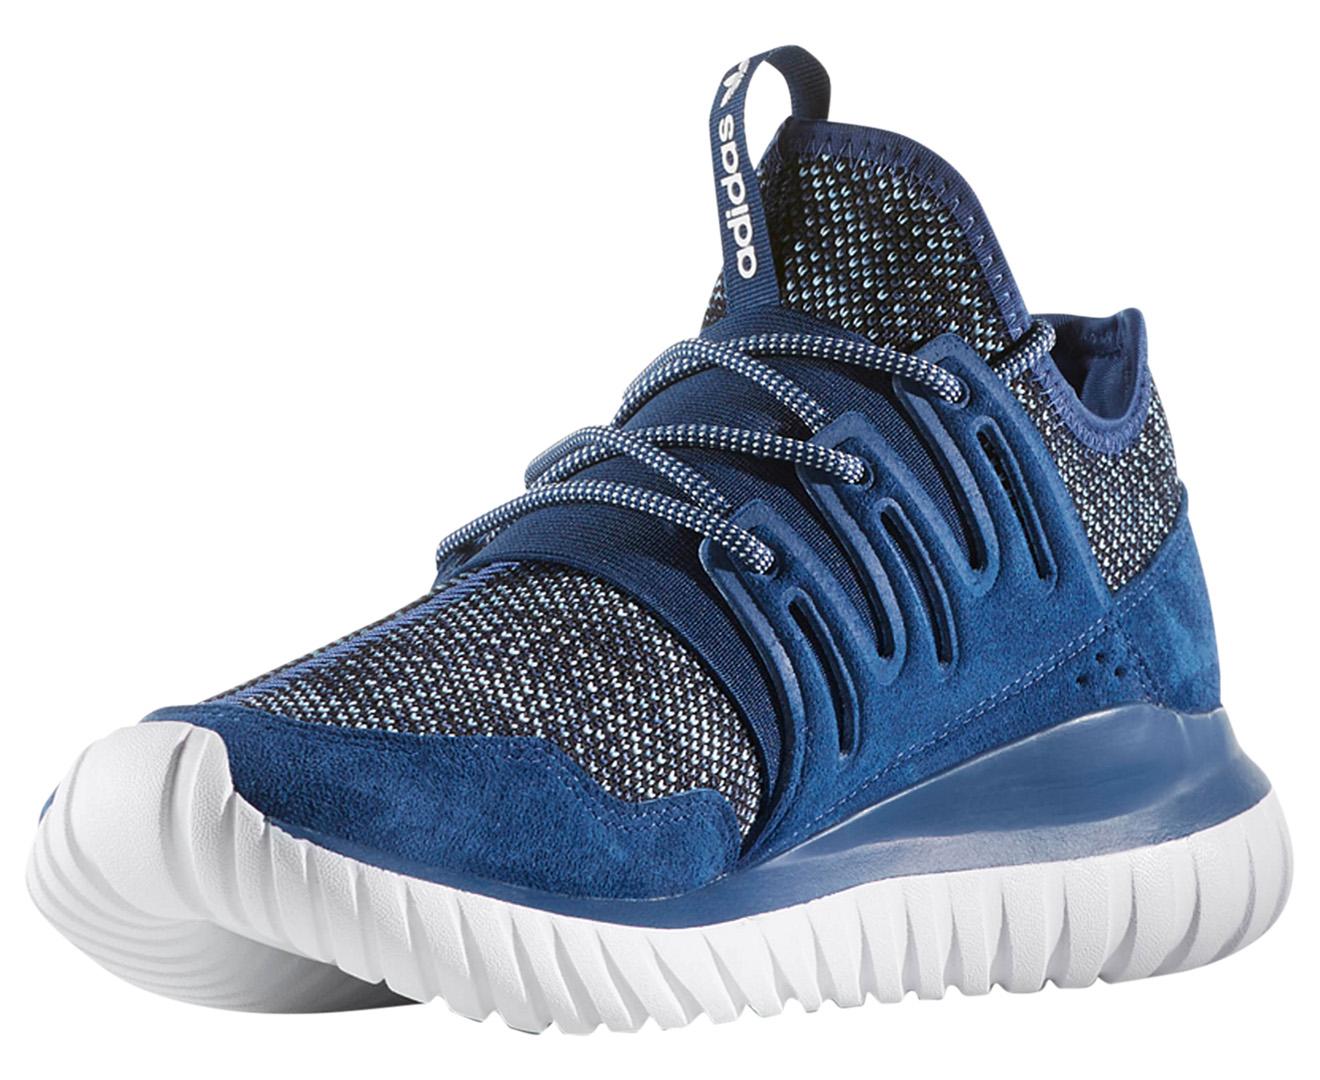 Adidas Originals Men S Tubular Radial Shoe Mystery Blue